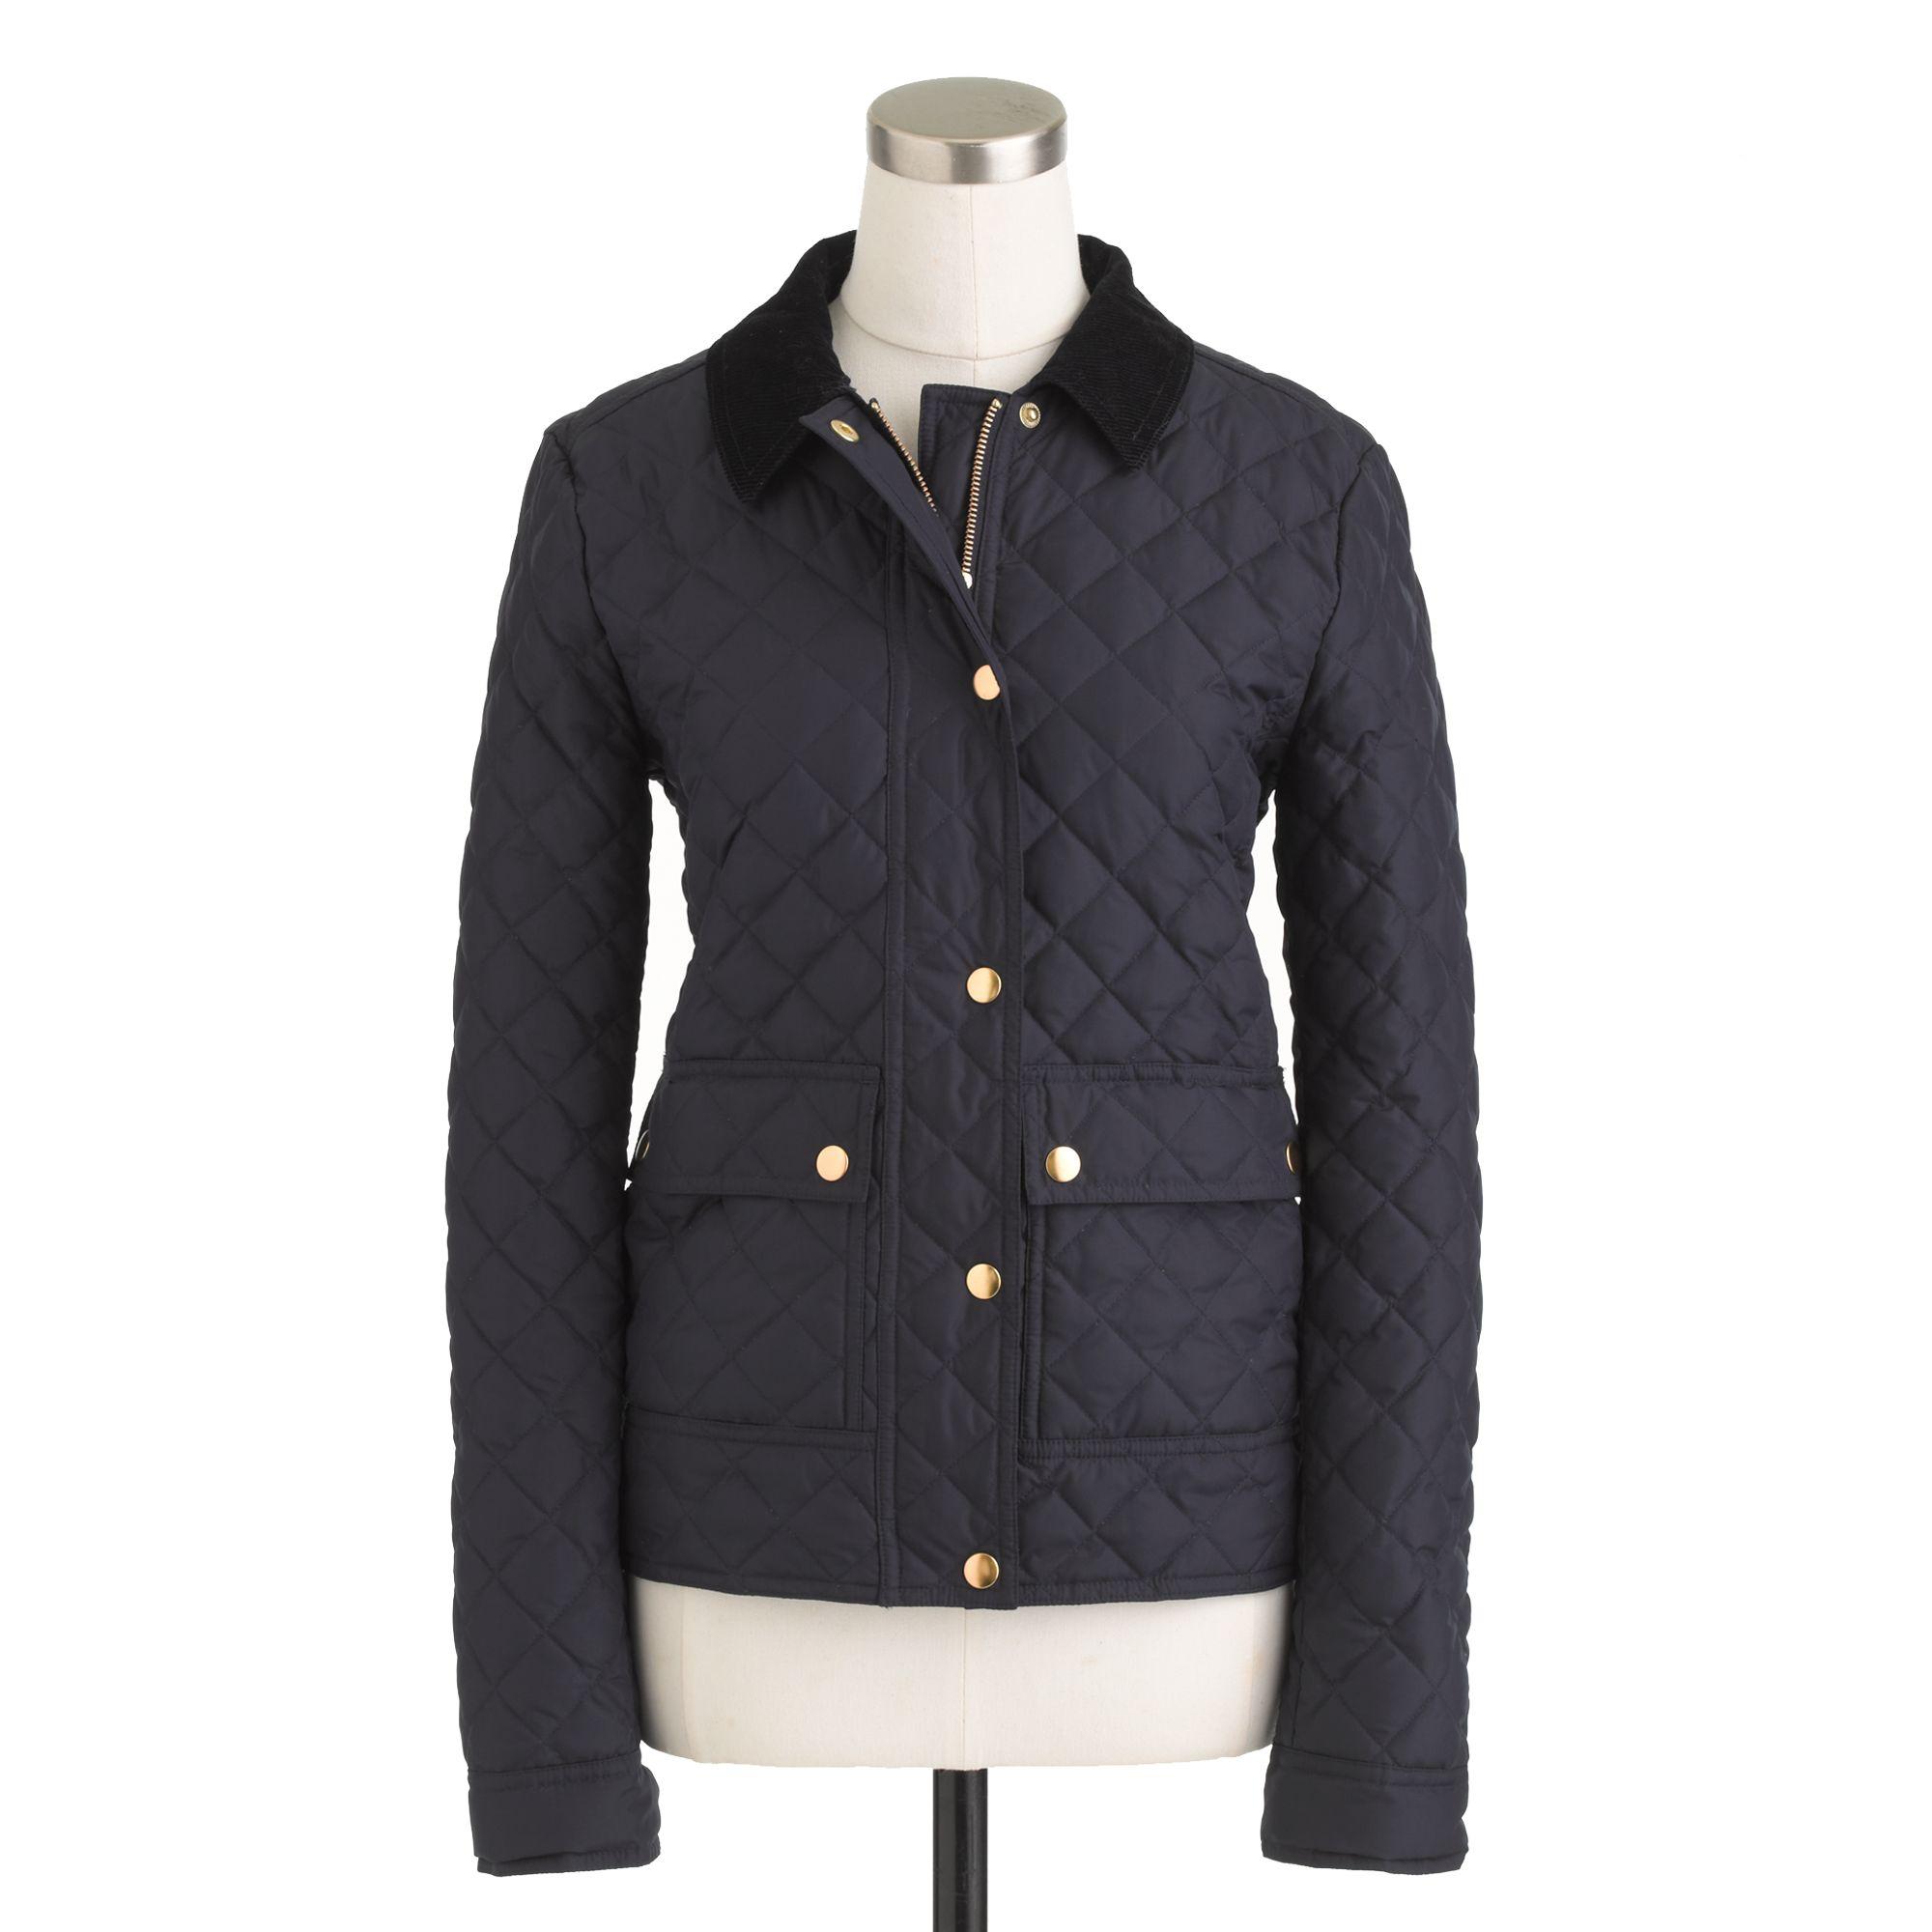 J crew womens jackets